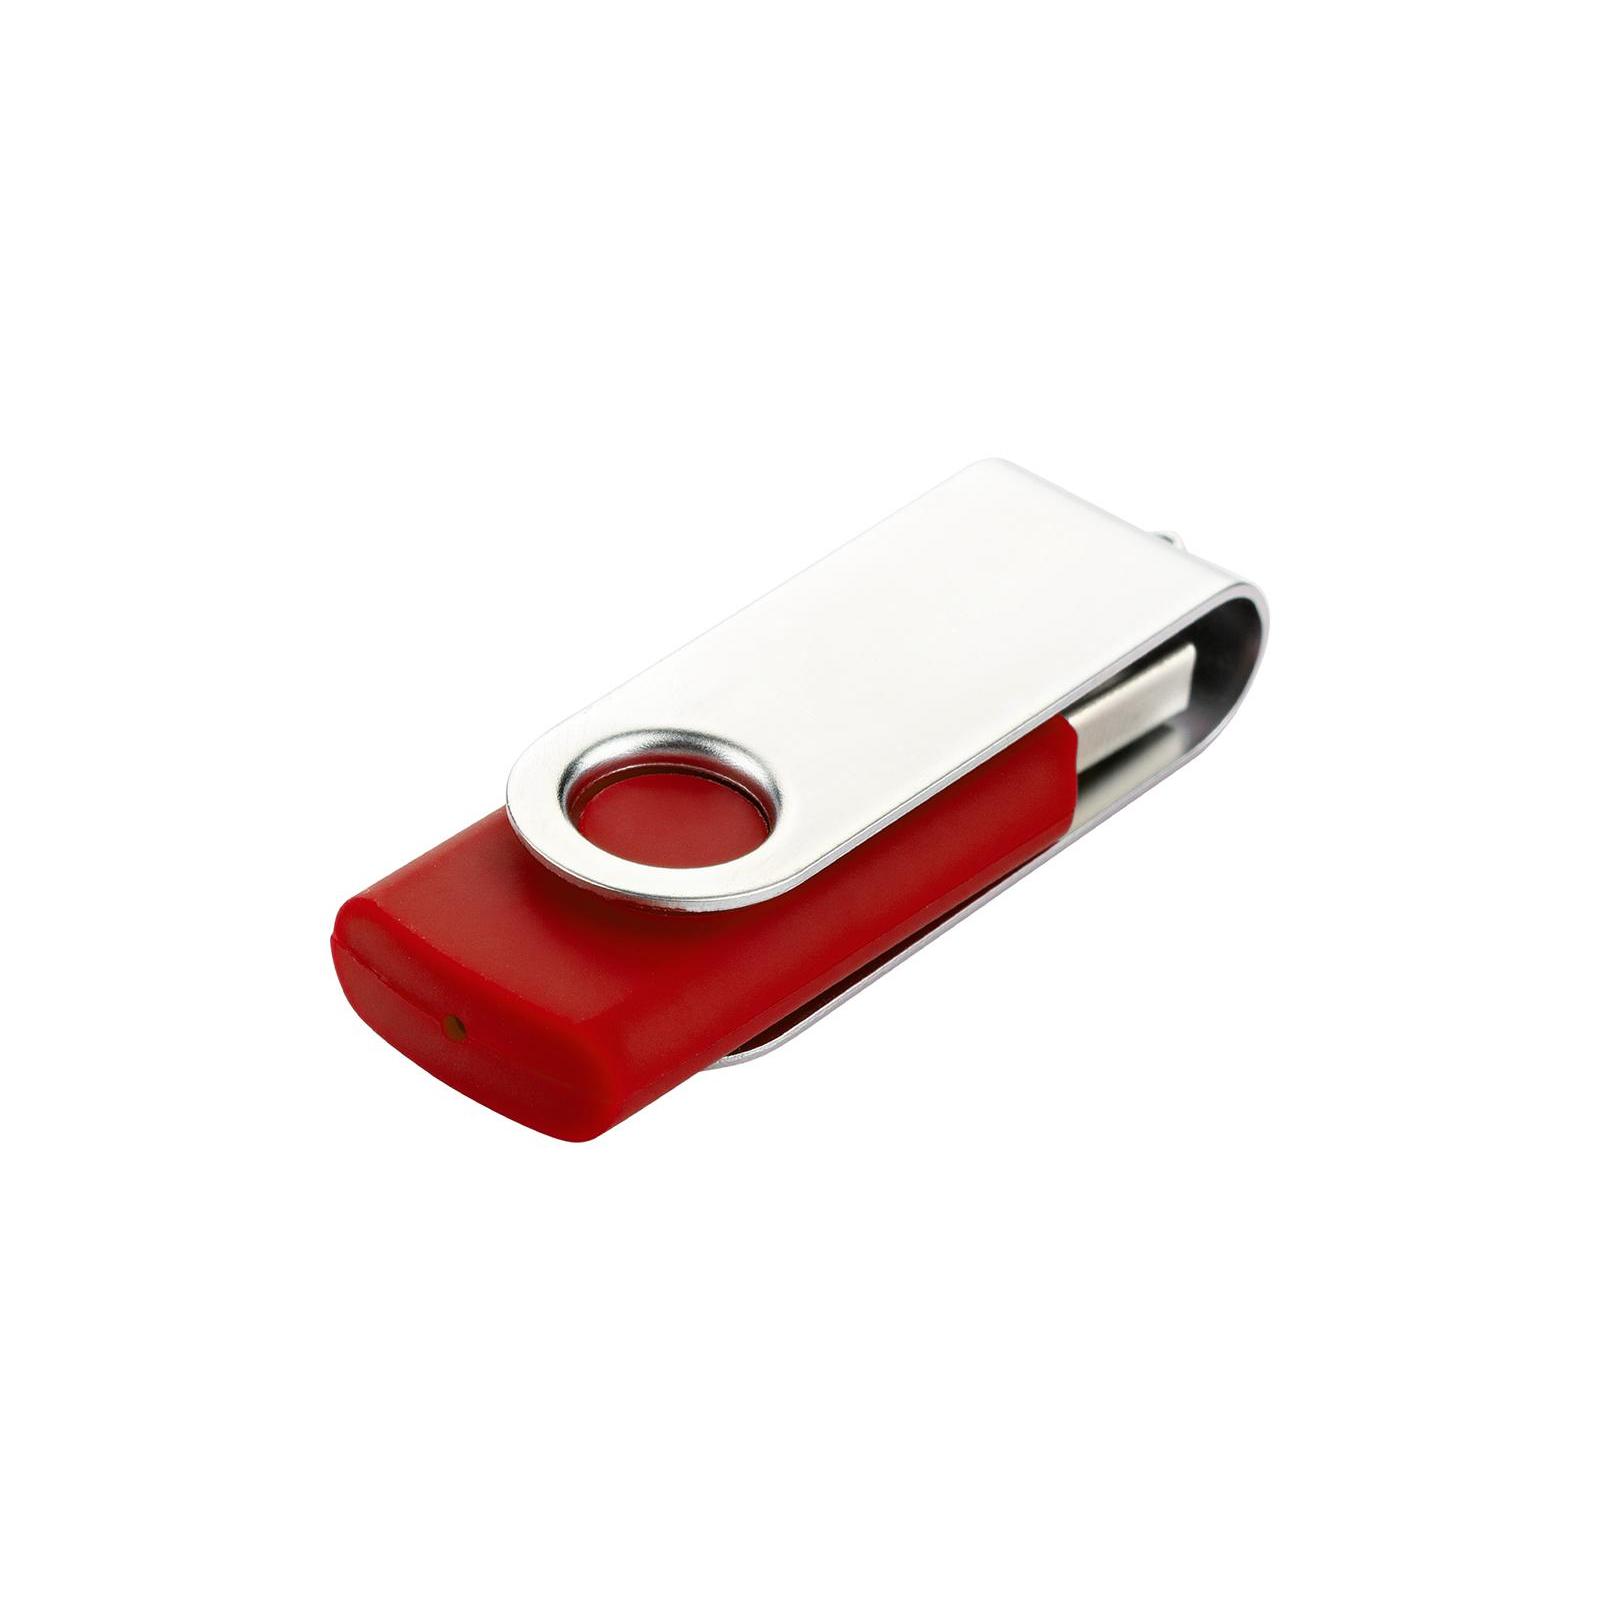 USB флеш накопитель eXceleram 32GB P1 Series Silver/Blue USB 2.0 (EXP1U2SIBL32) изображение 6